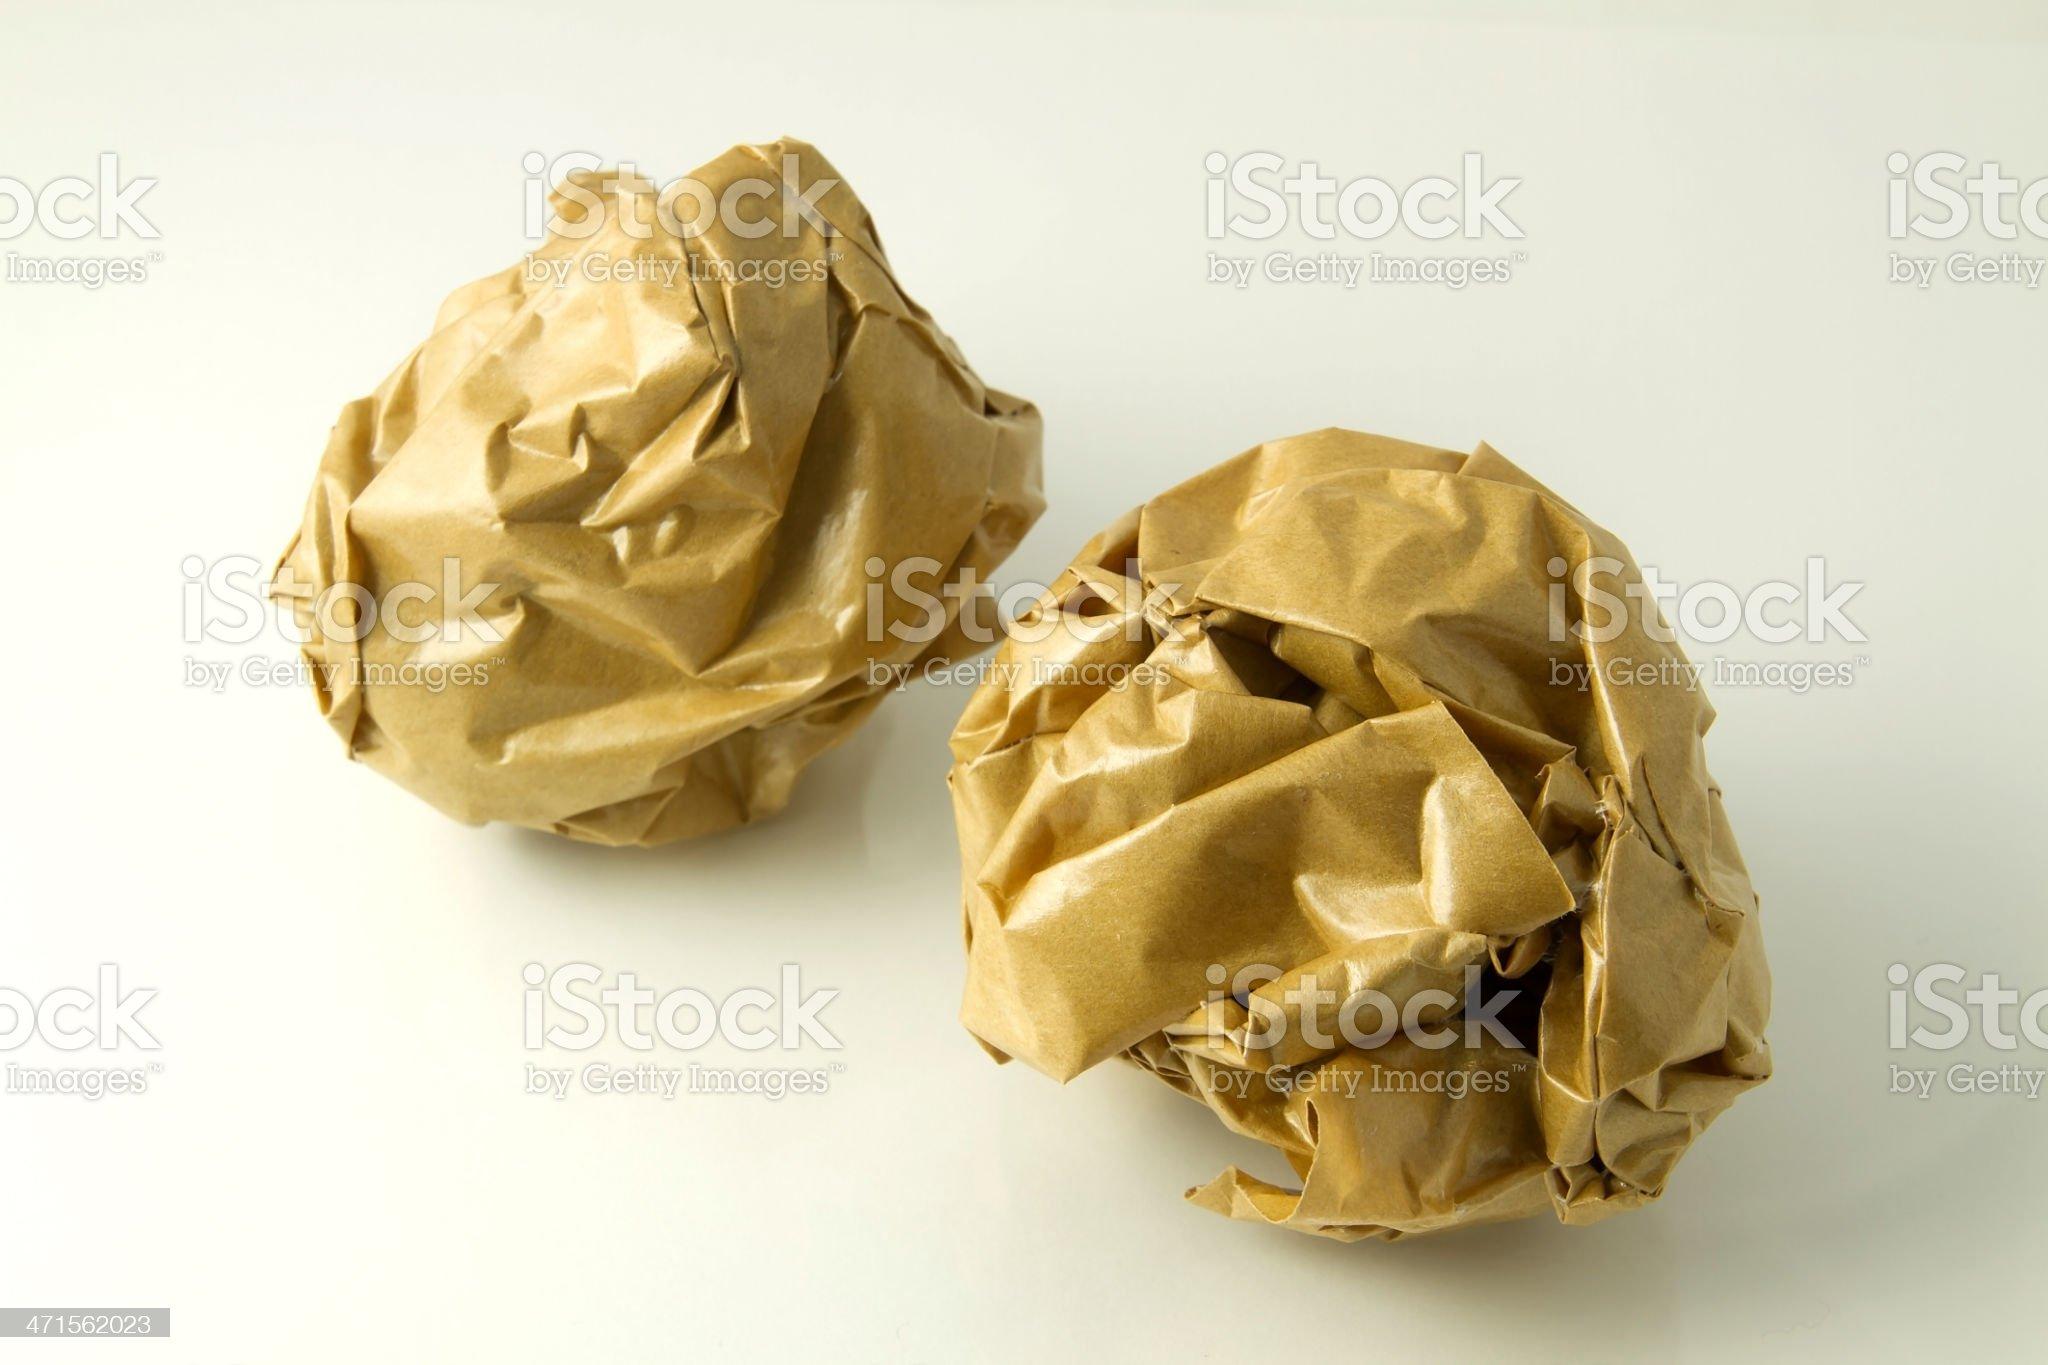 Brown paper balls royalty-free stock photo